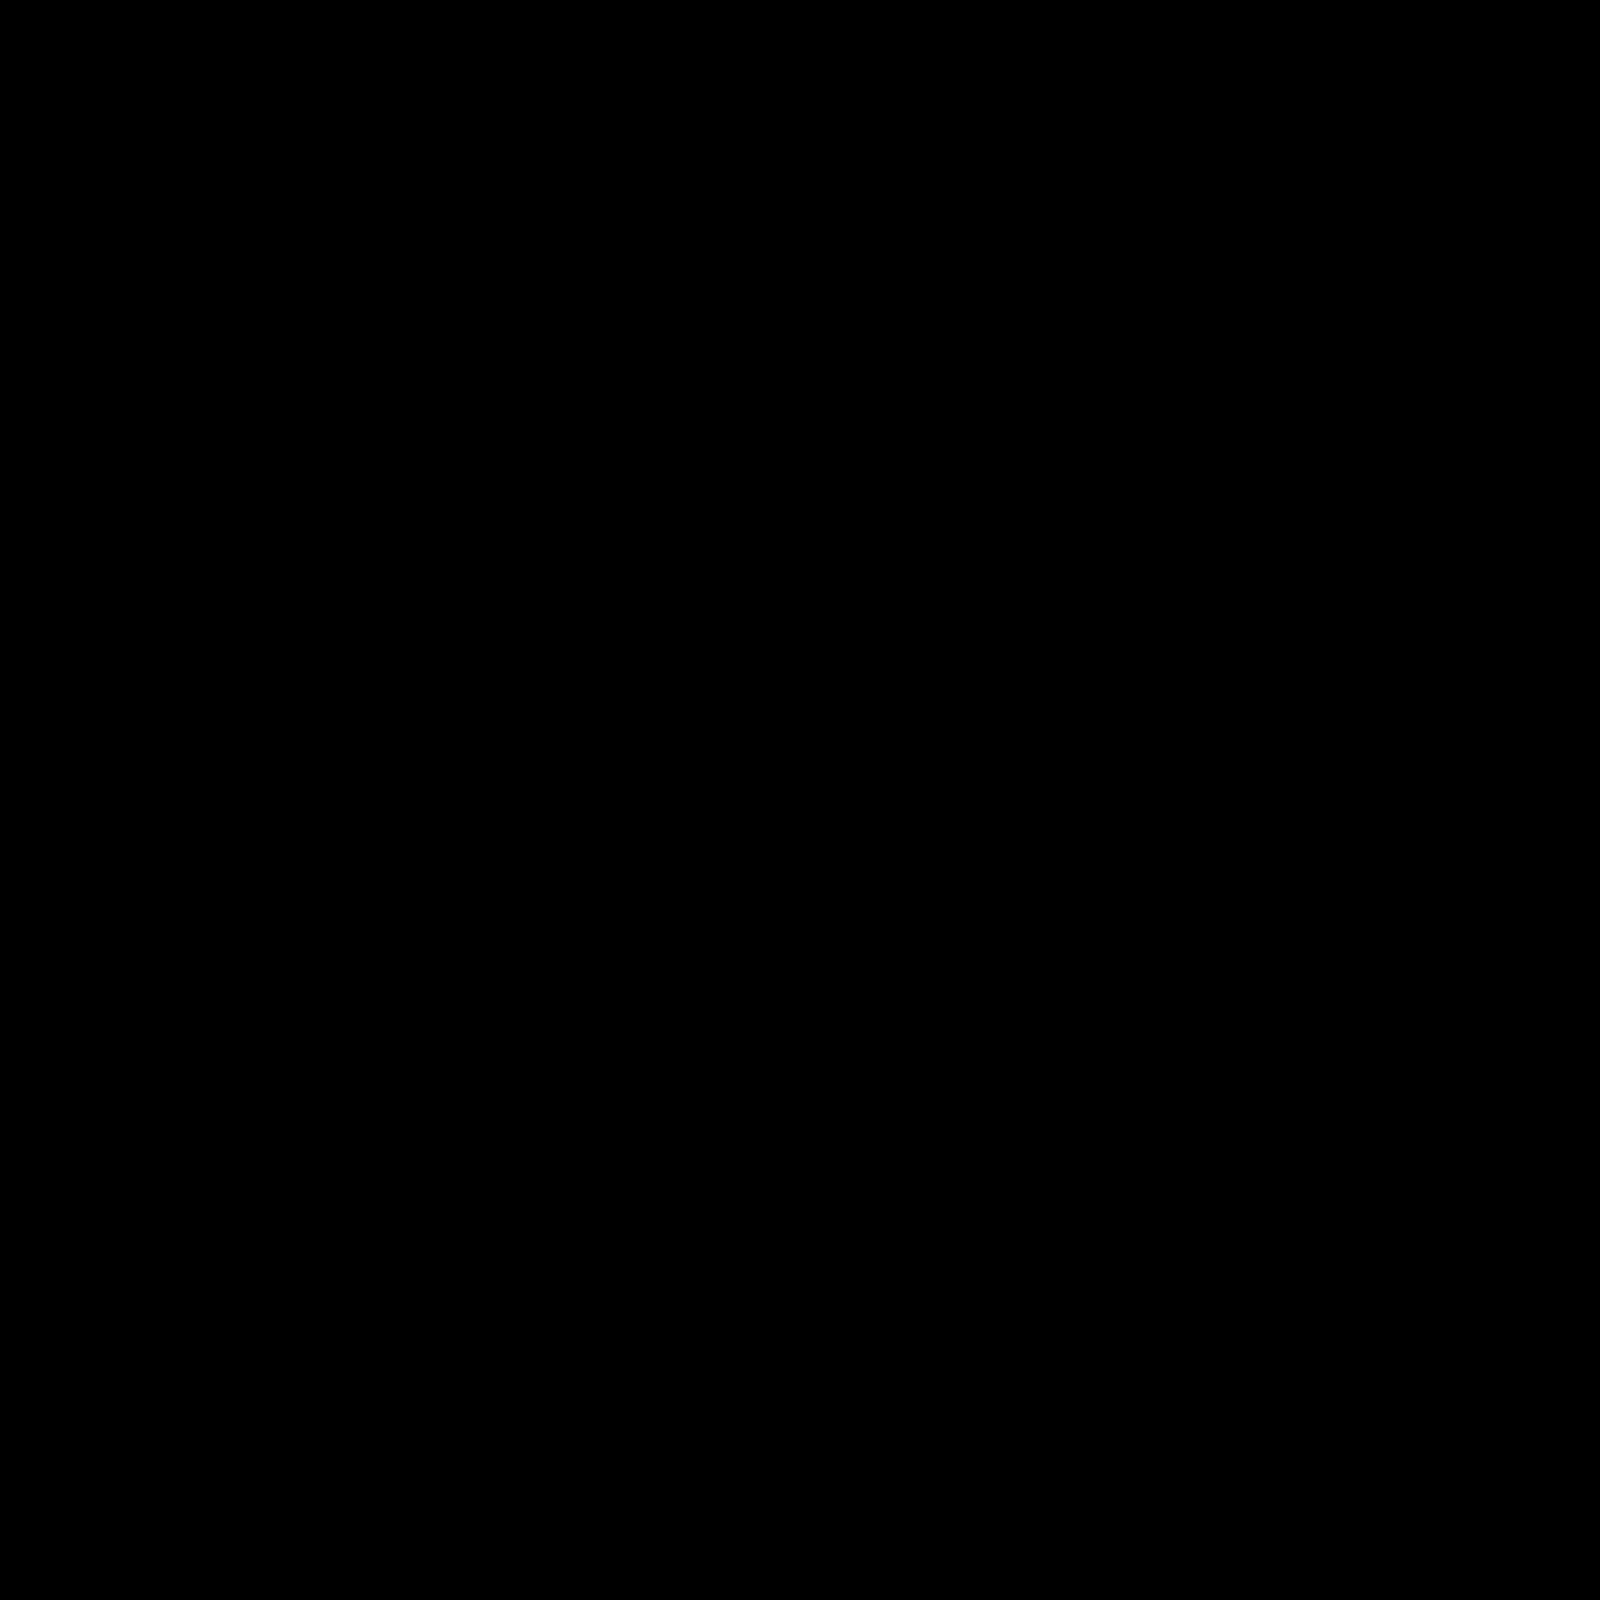 Mittelfinger icon - PNG Mittelfinger